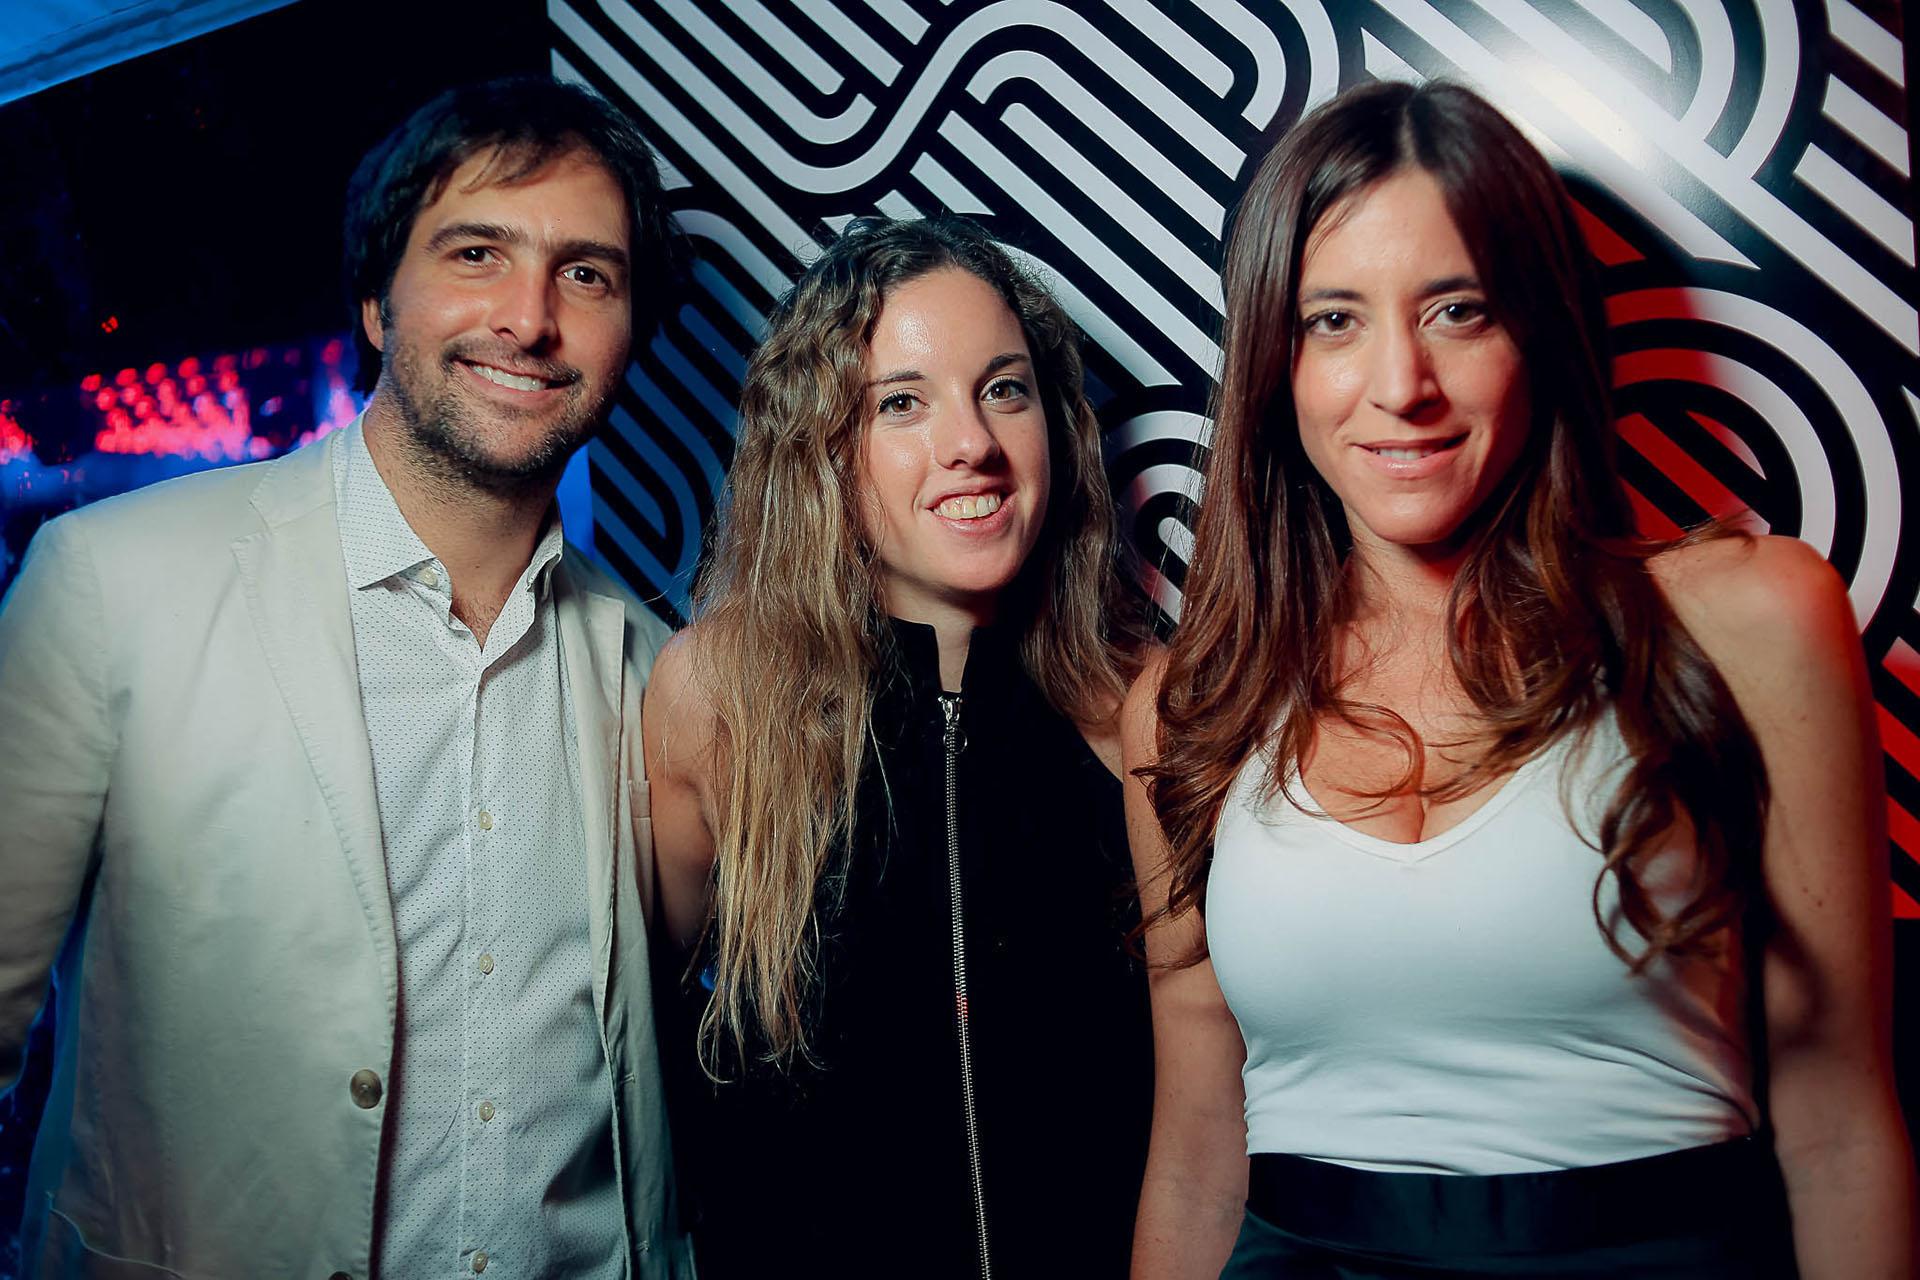 Ulises Ricchardi, Loli Martin y Herrera y Manuela Rattazzi